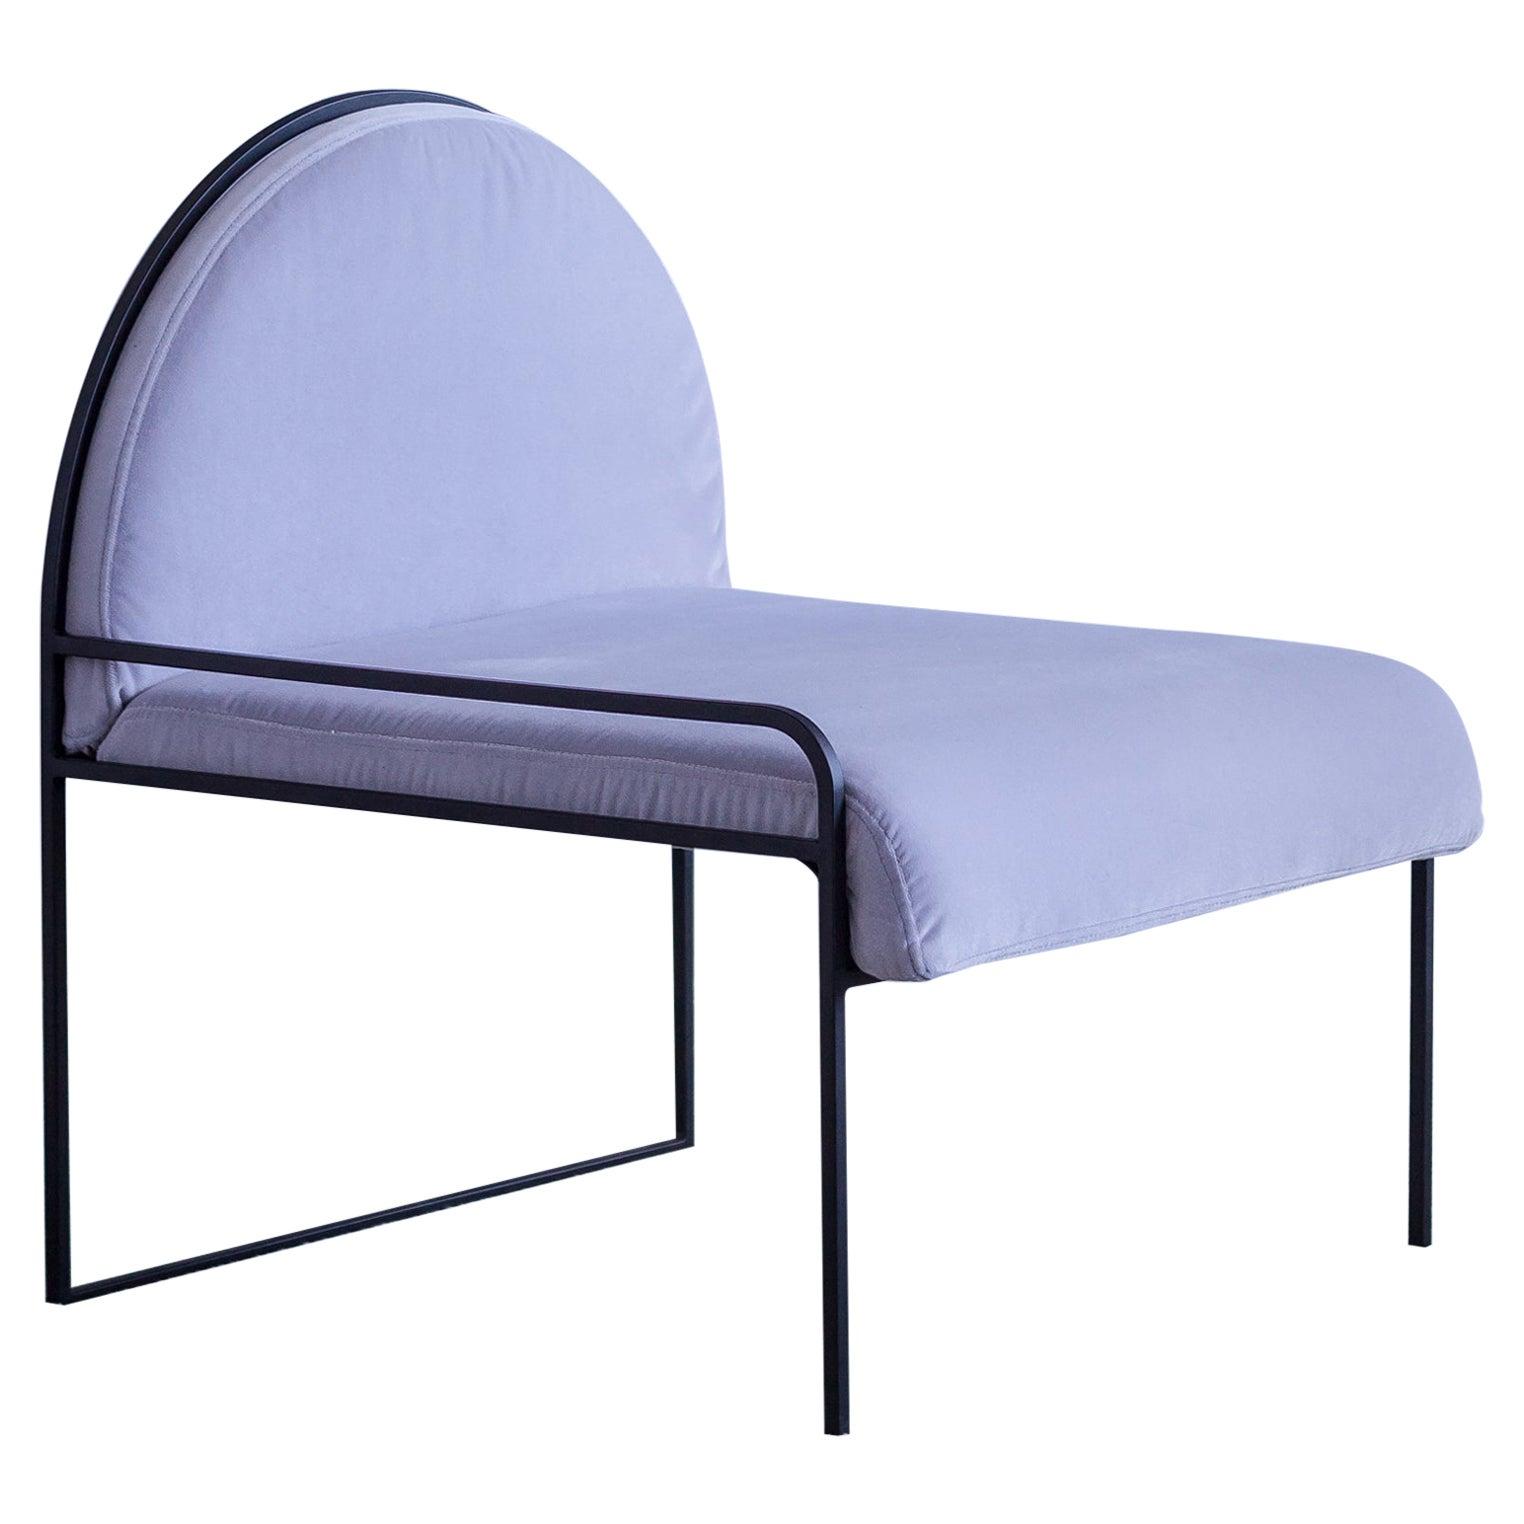 SW Velvet Chair by Soft-geometry